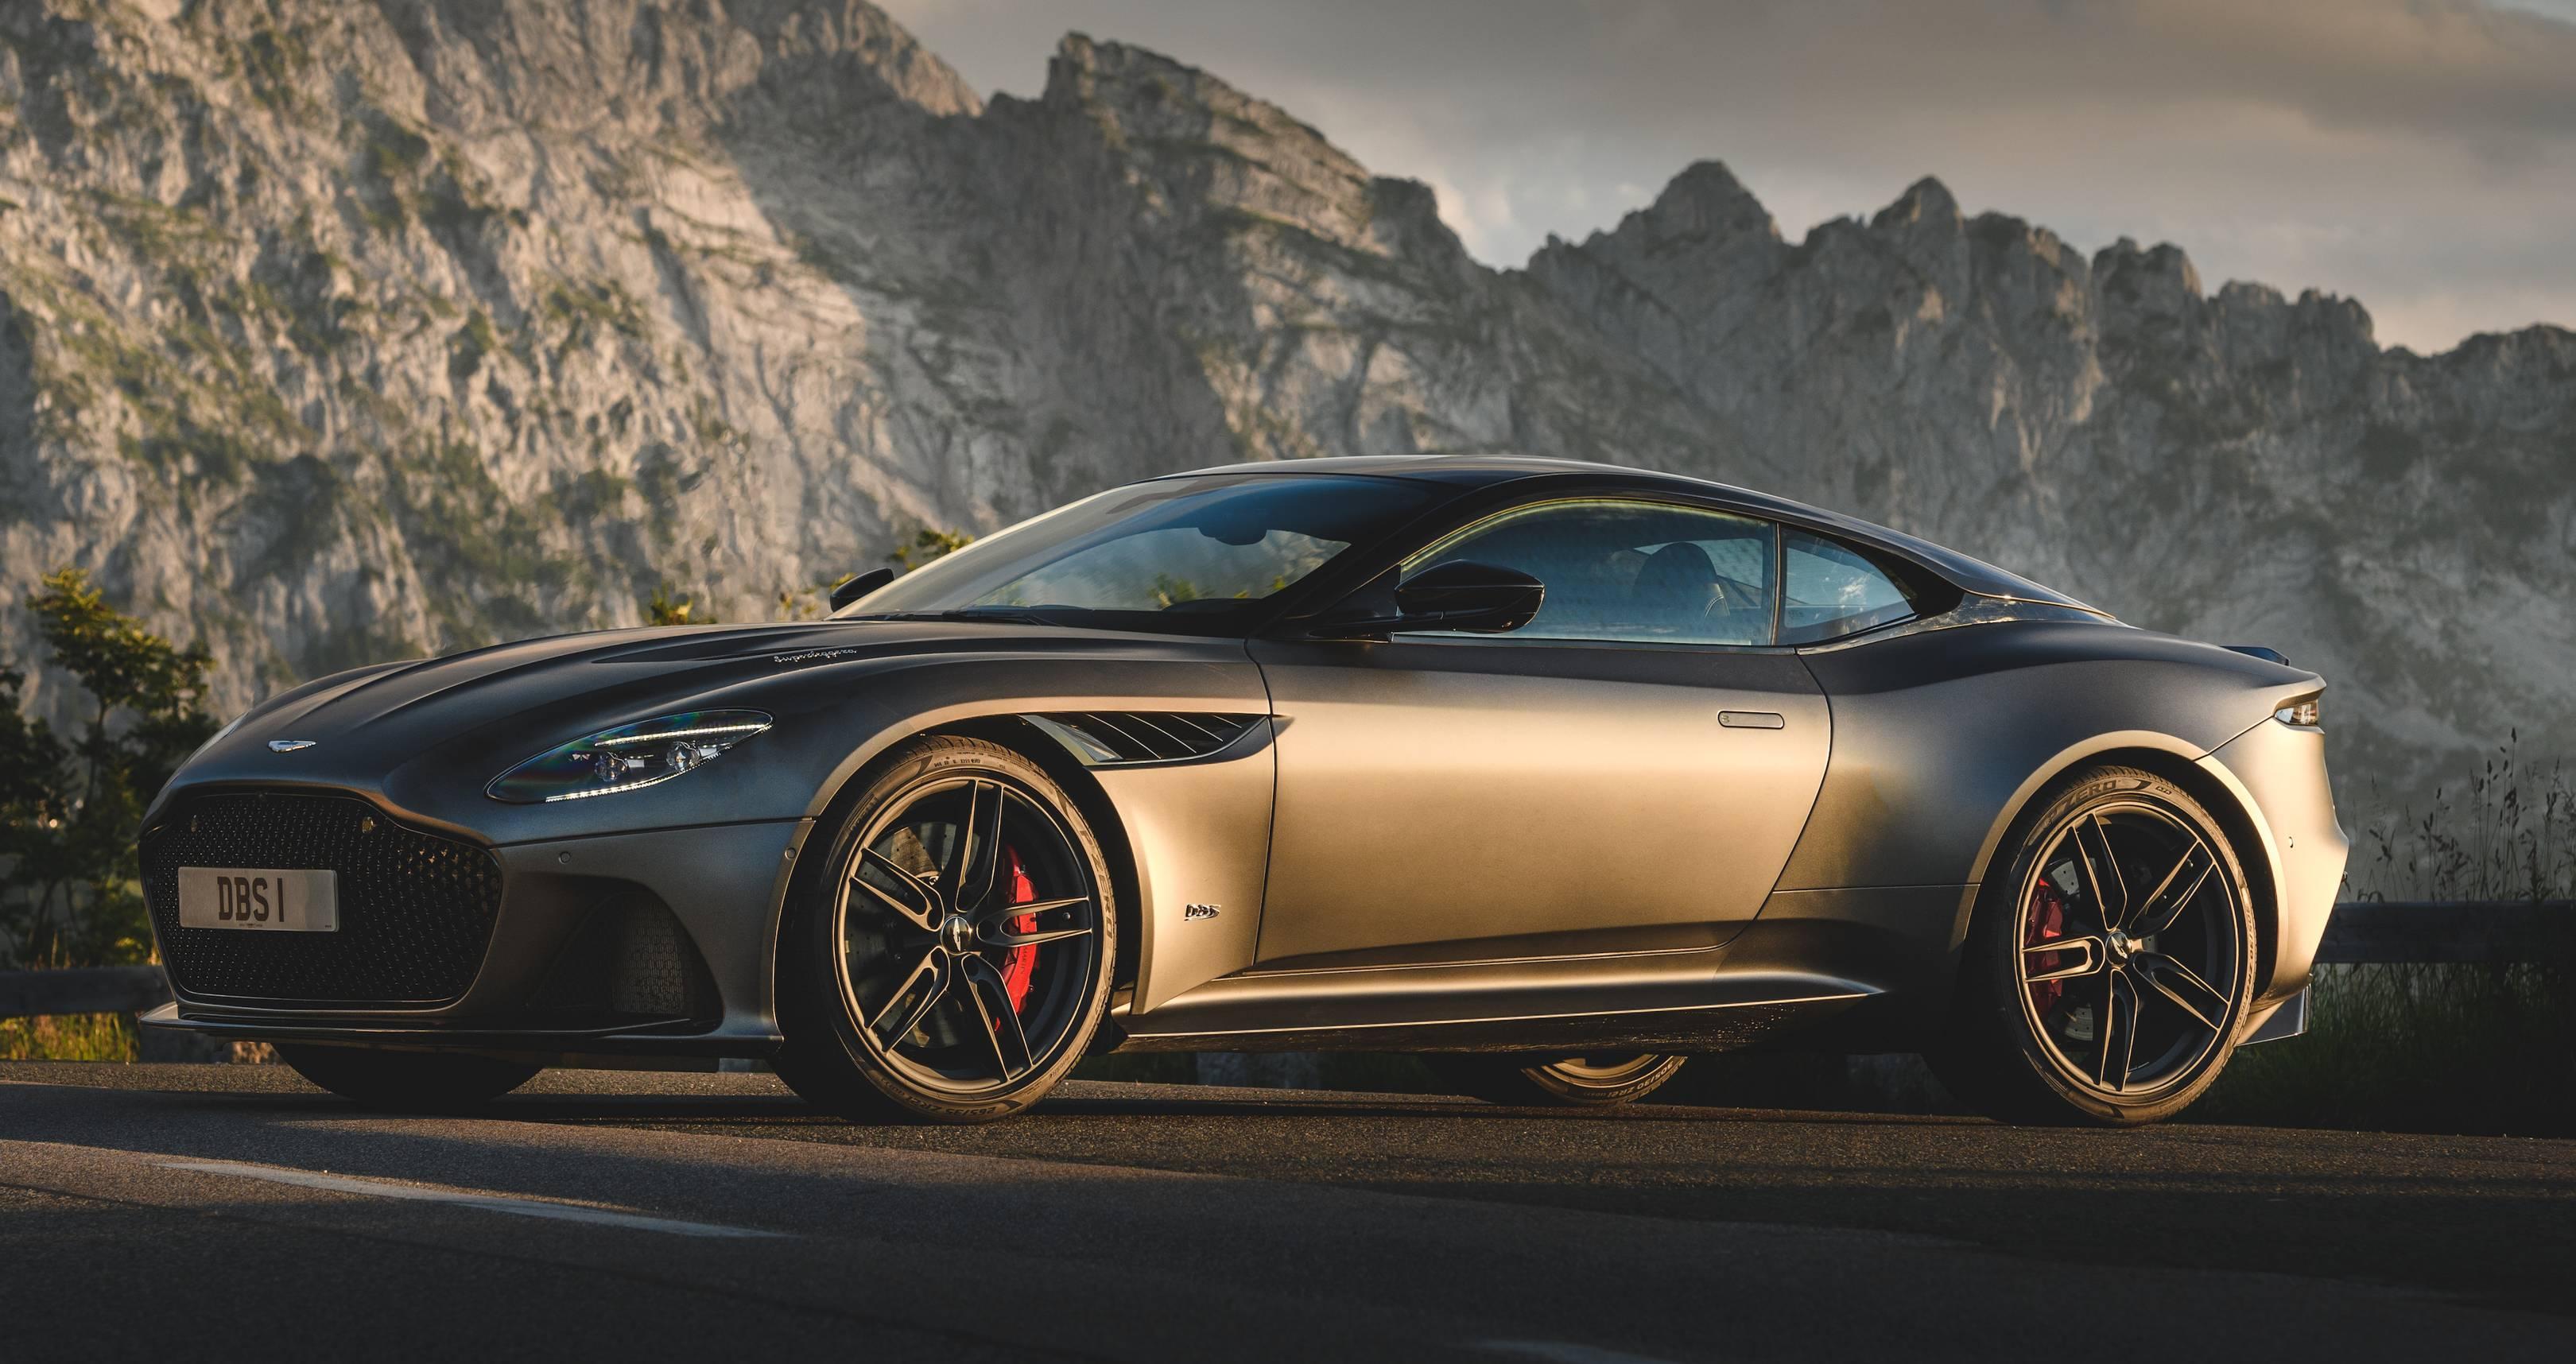 The Aston Martin Dbs Superleggera Is An Exhilarating Vanquish S Successory Wired Uk